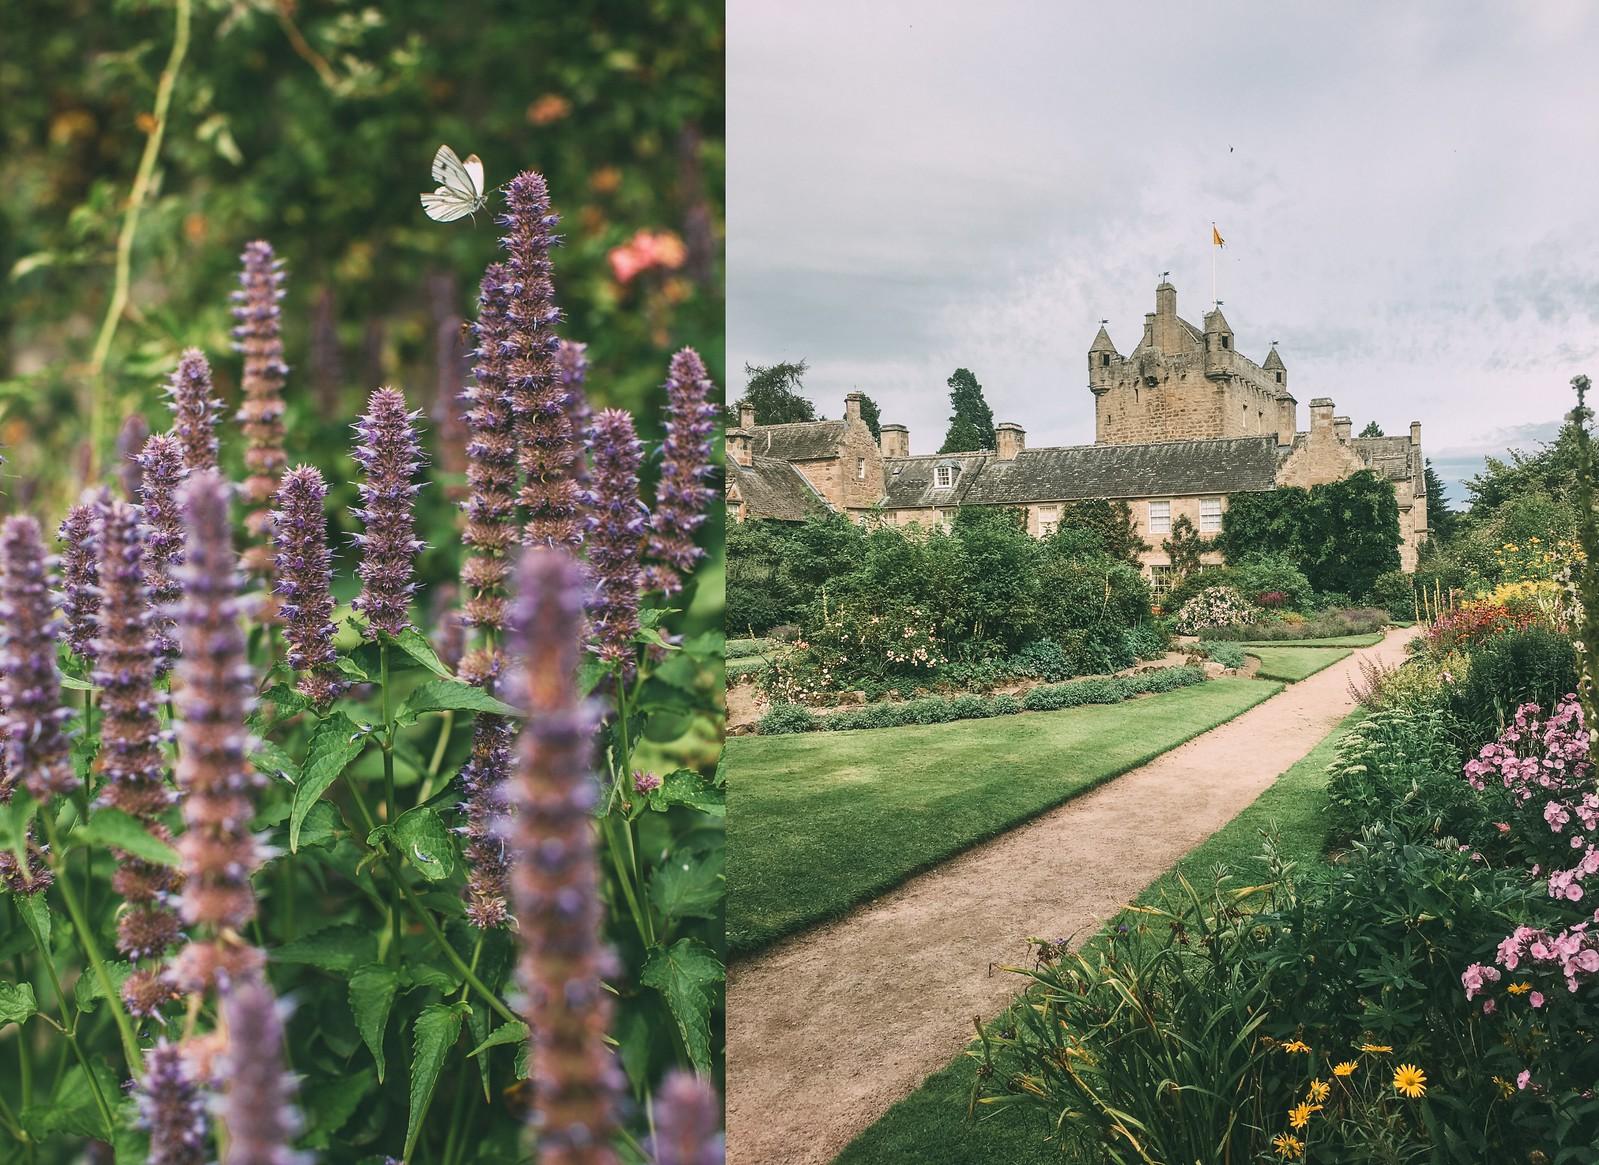 cawdor castle-2-side